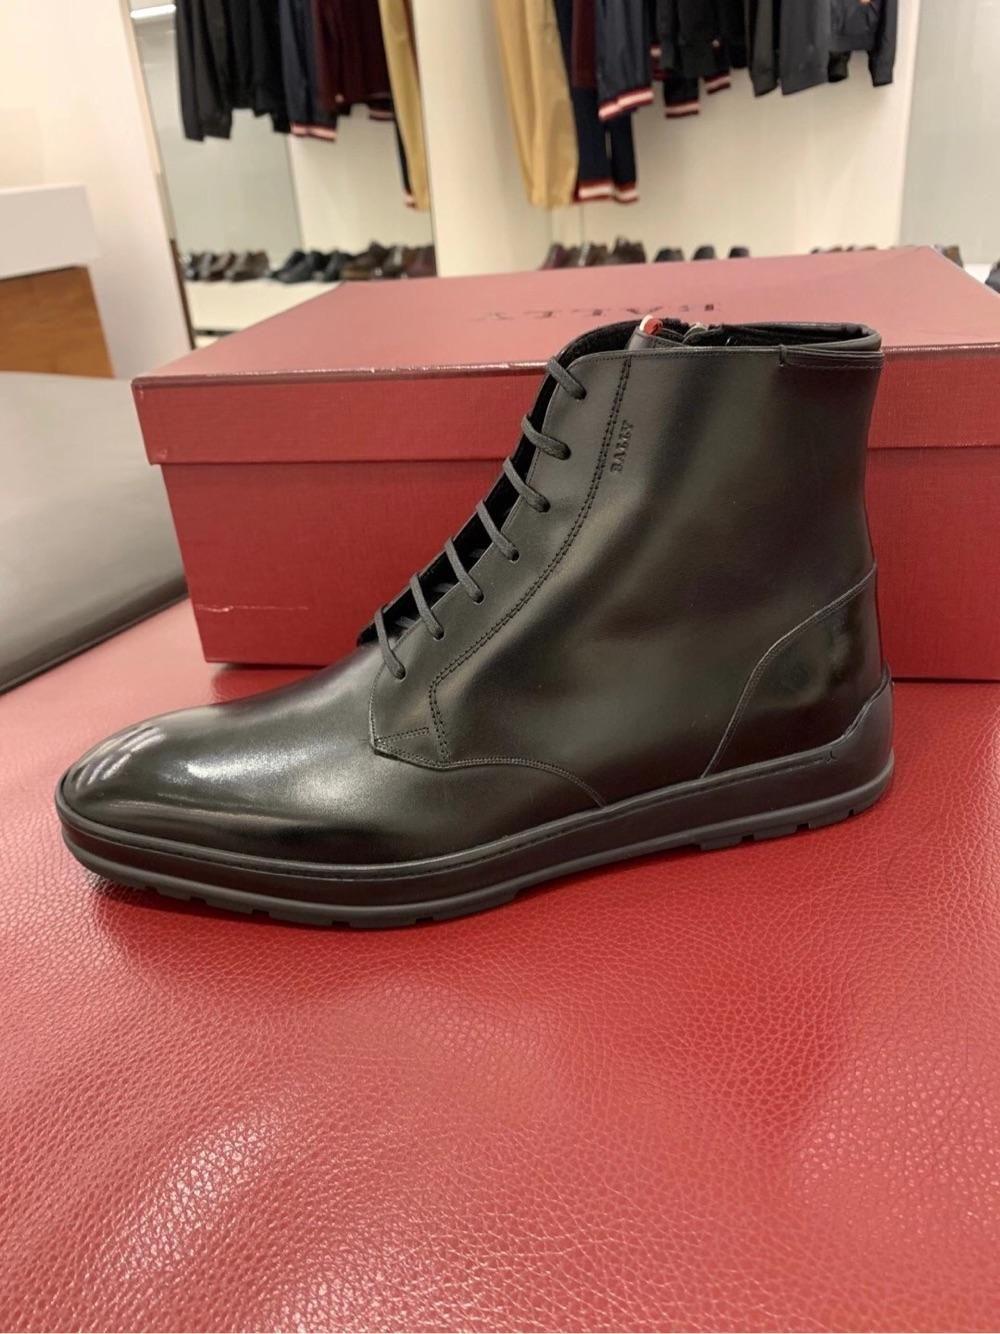 Bally今日折扣!男士内里加毛款黑色全皮短靴2690???